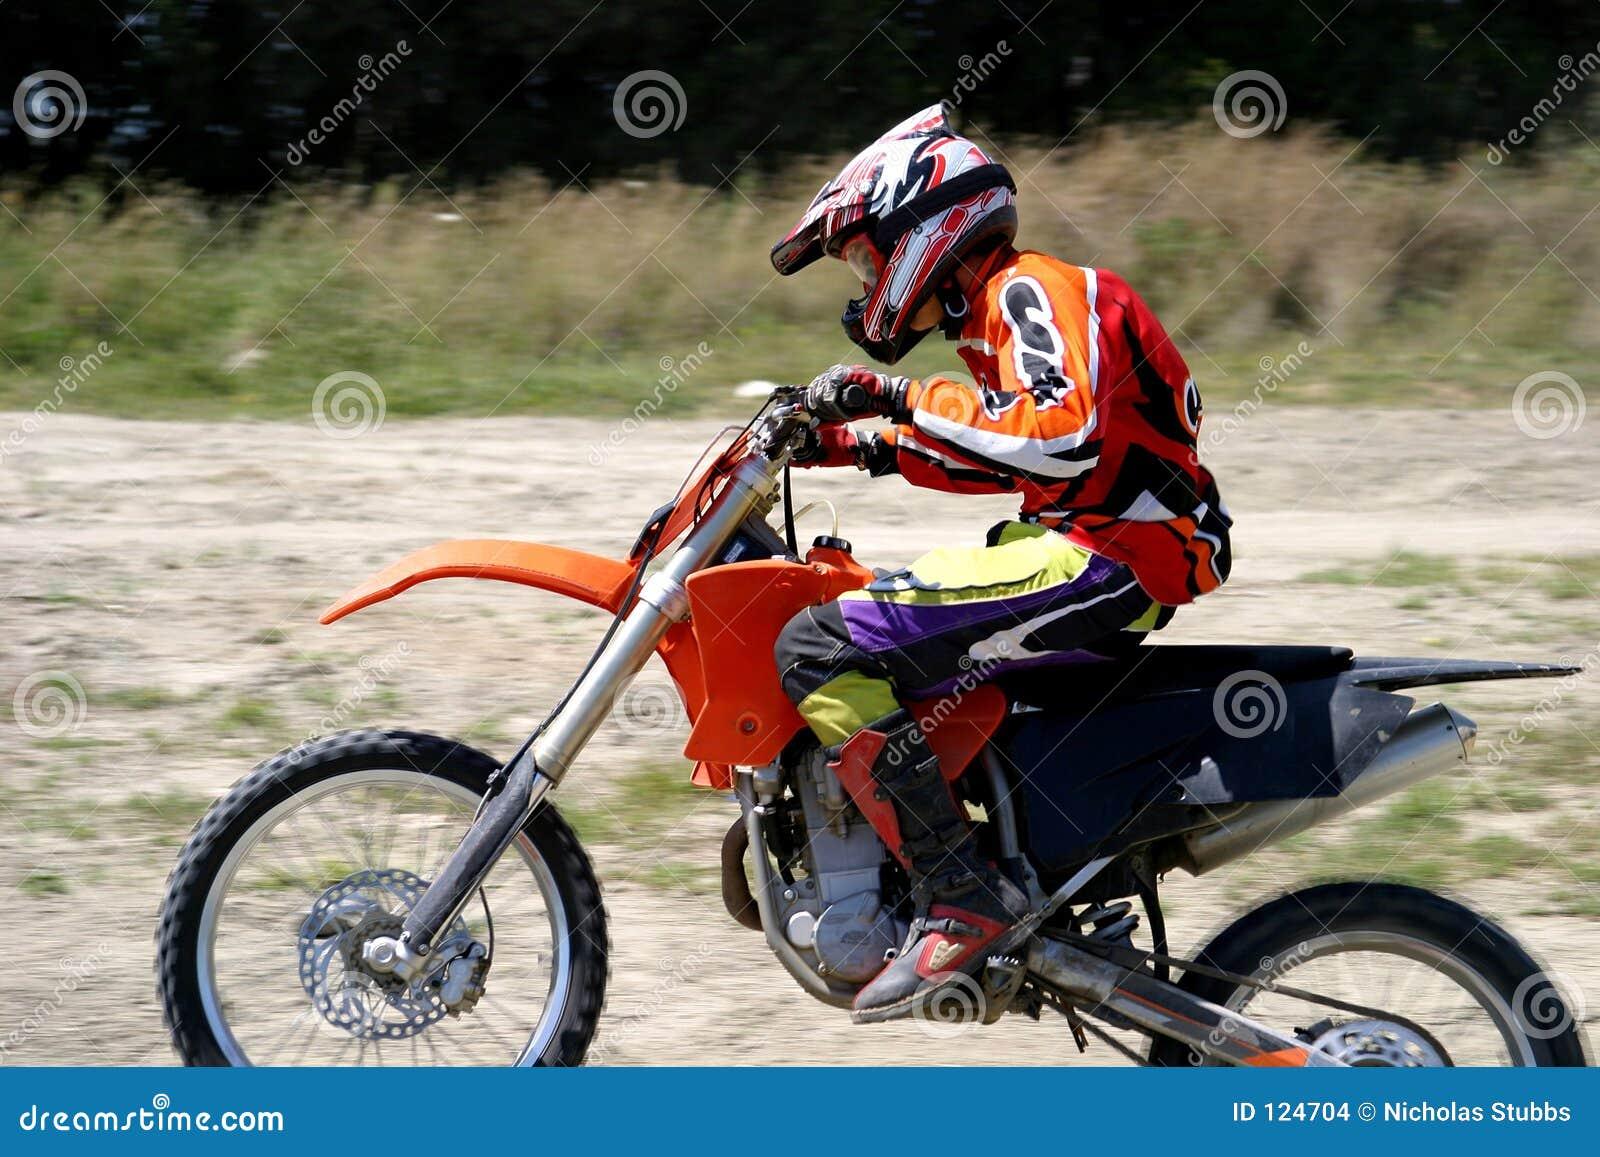 Speeding Moto X Bike Rider With Blurred Background As He